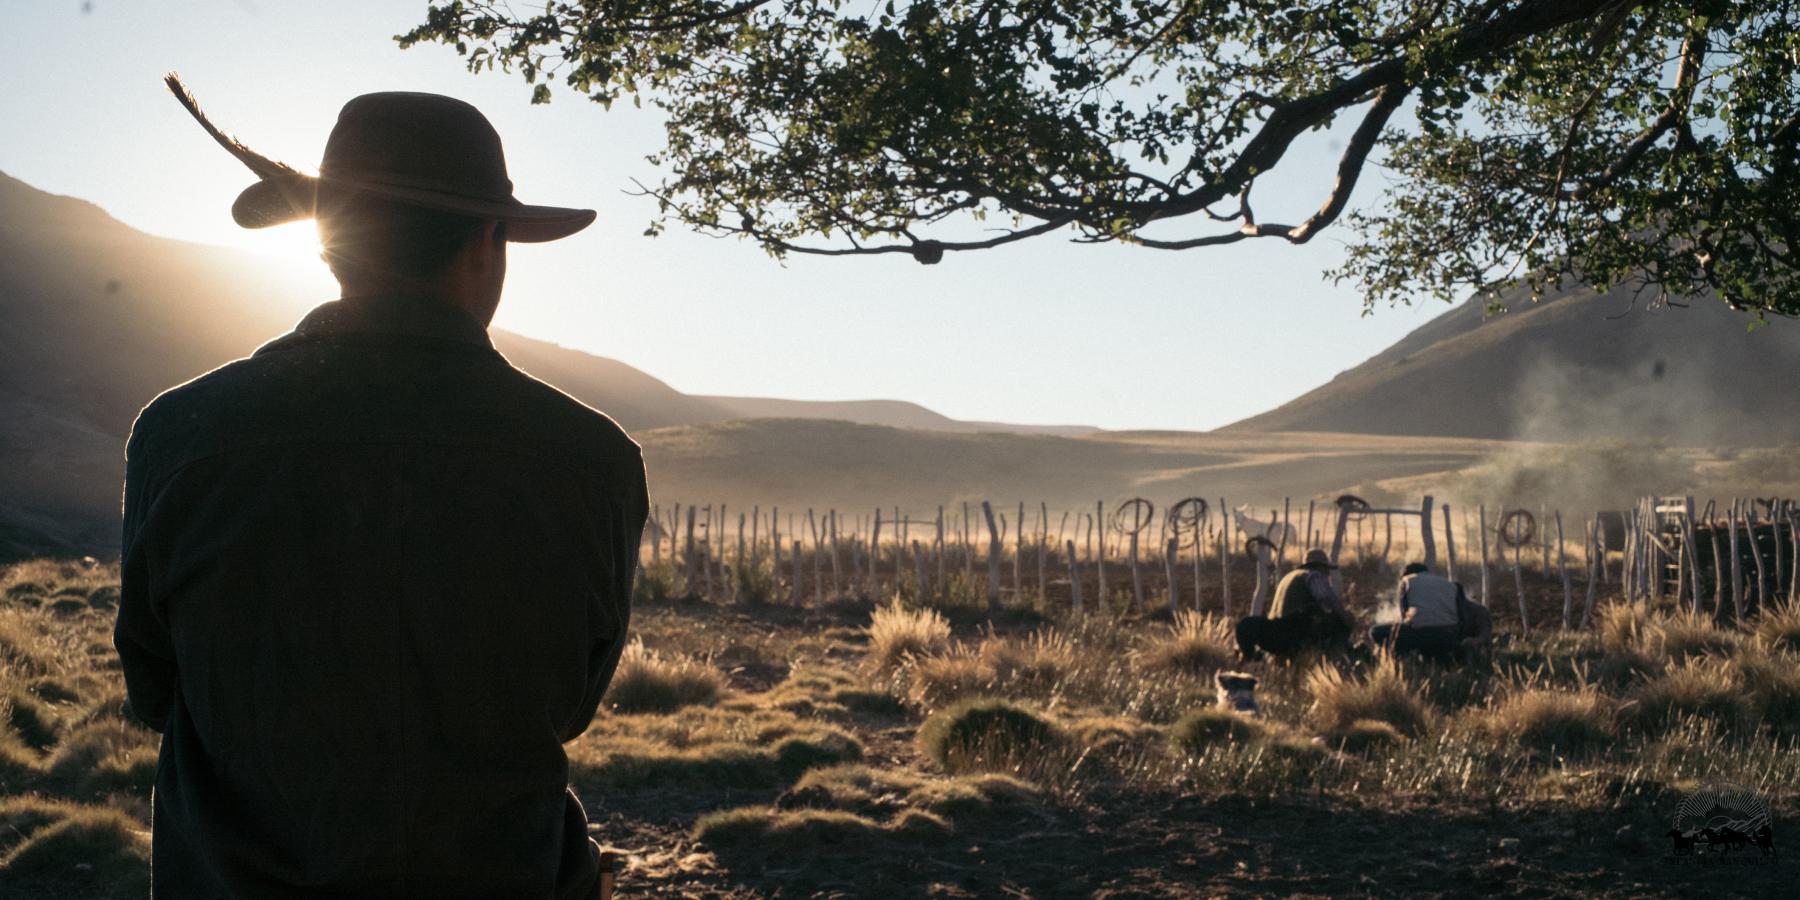 Silhouette of man watching gauchos at Estancia Ranquilco in Argentina